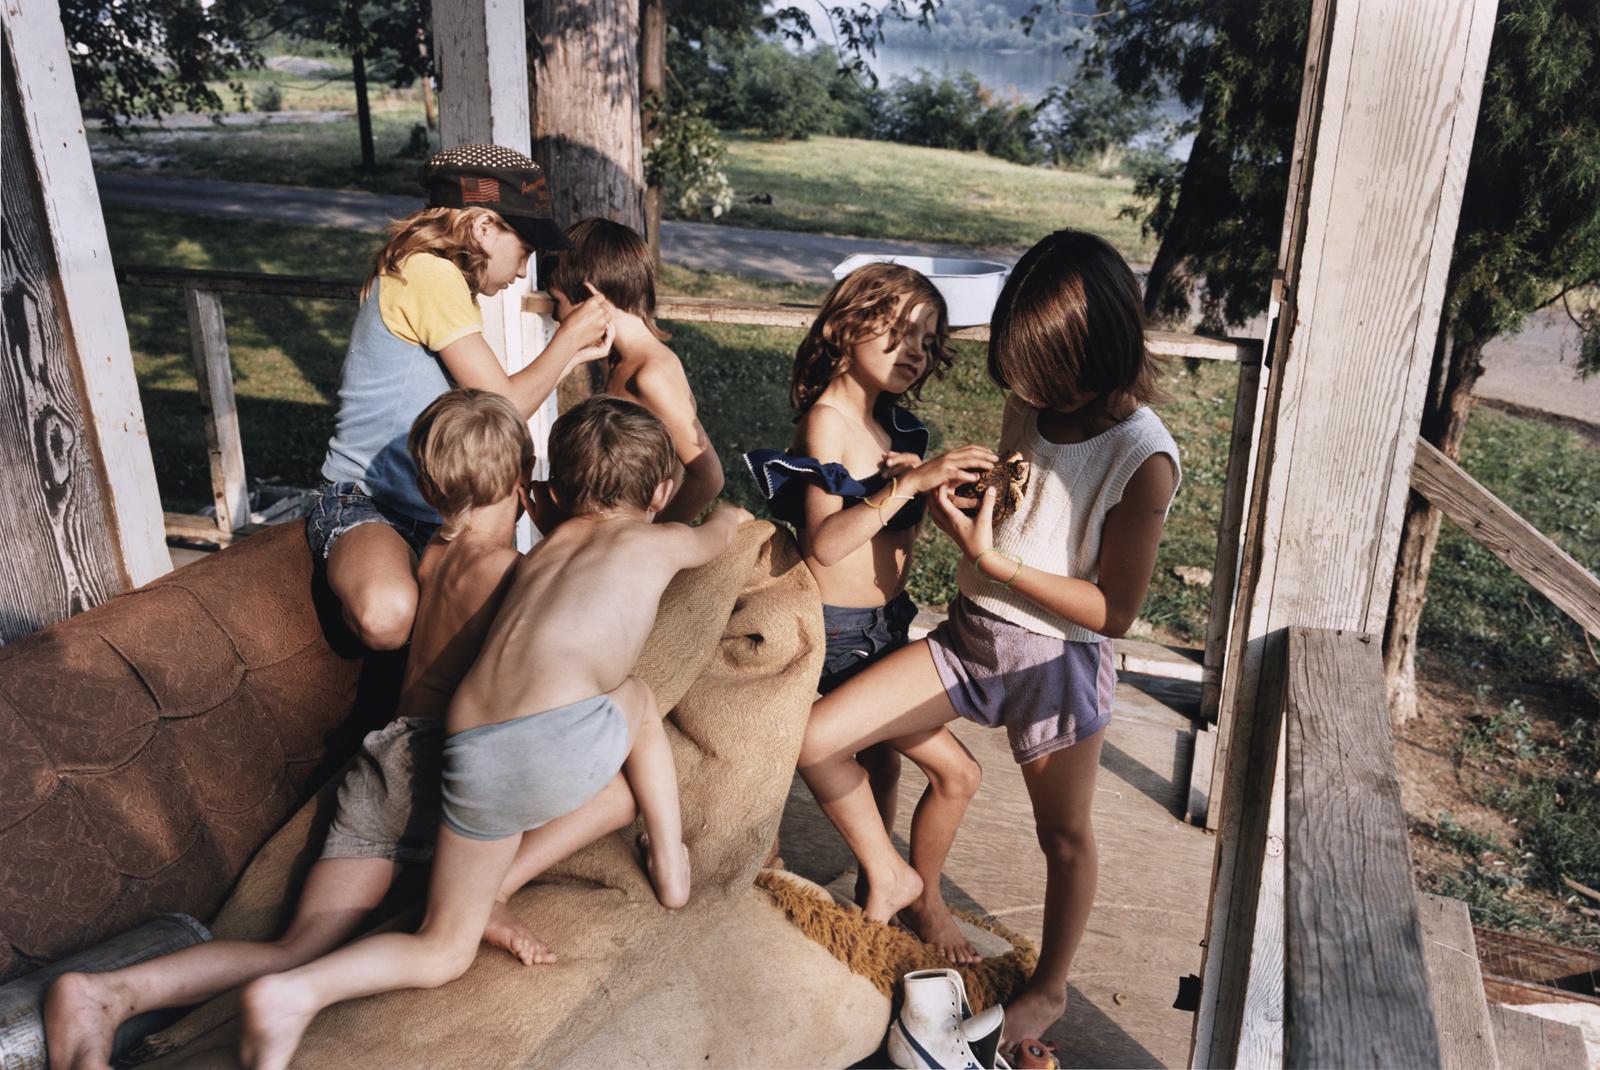 © Sheron Rupp, Marietta, Ohio, 1985